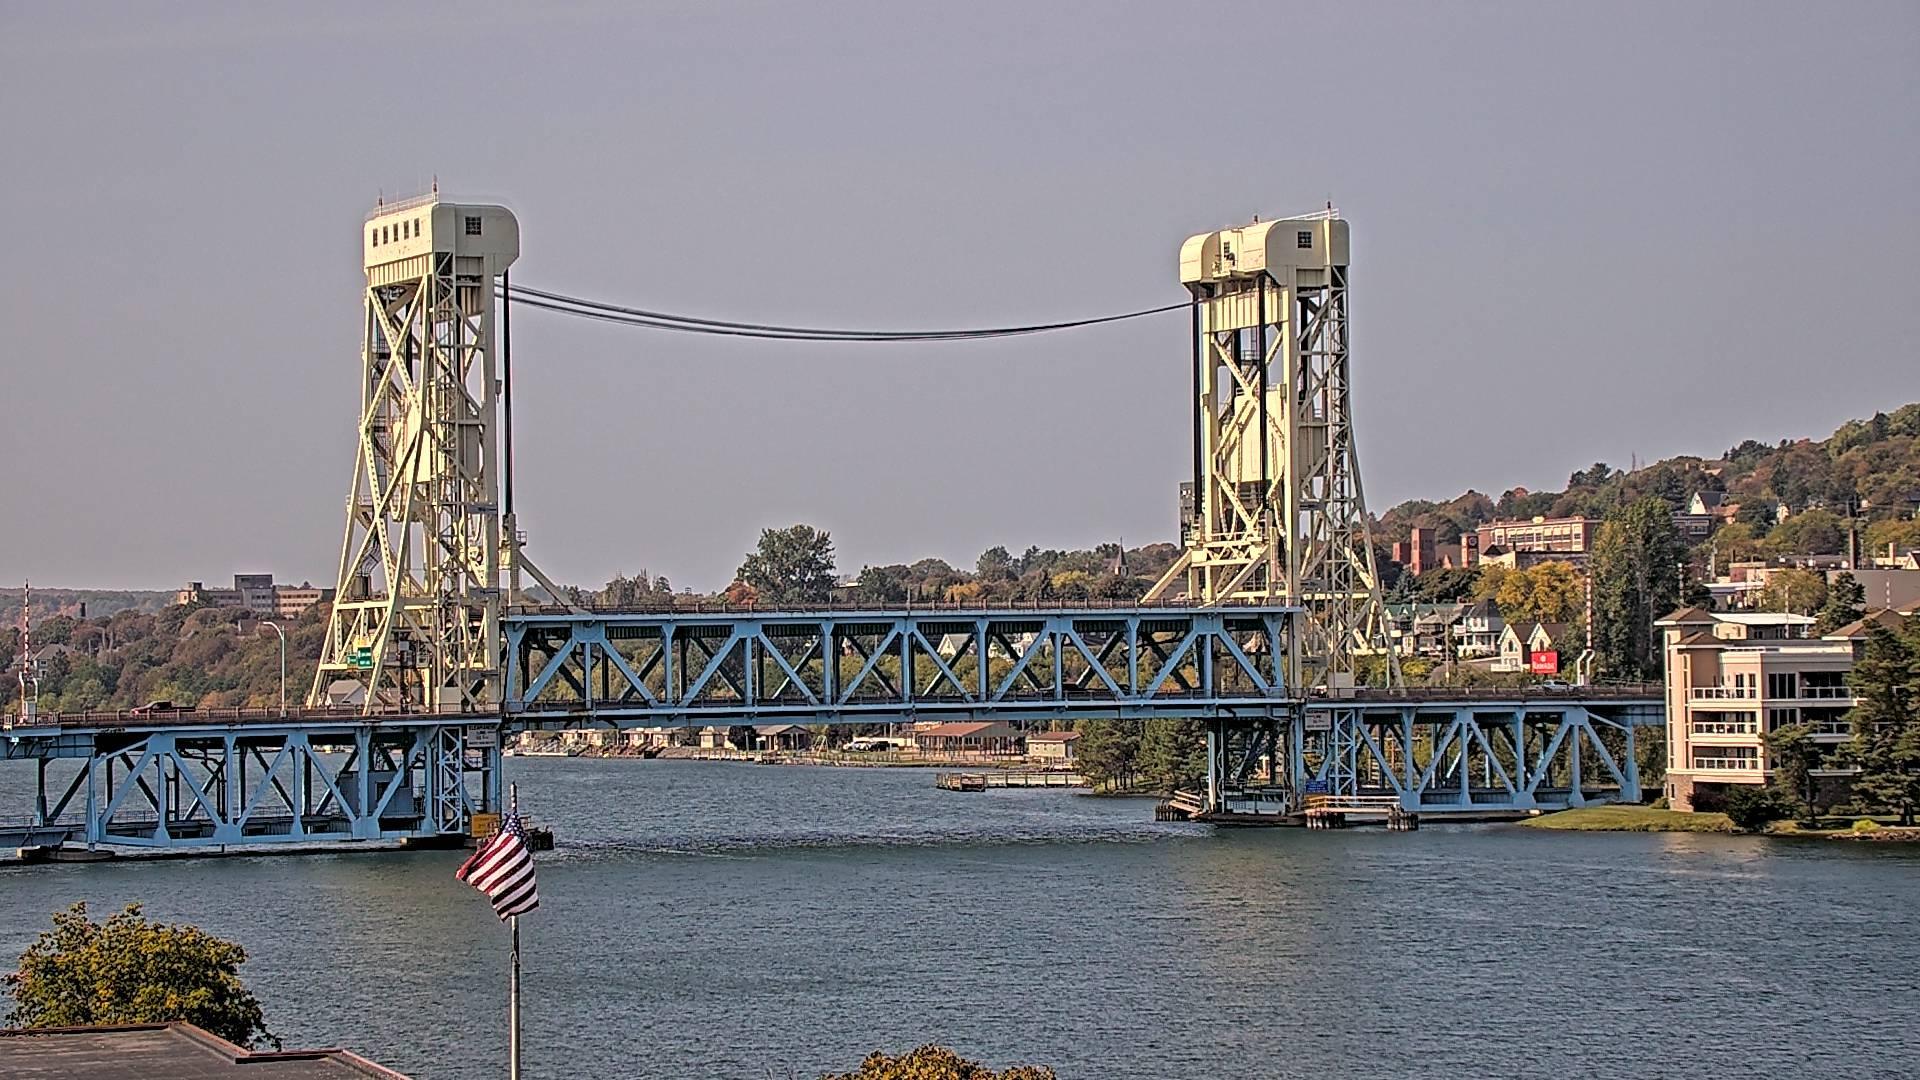 Webcam Hurontown: Houghton − Bridge